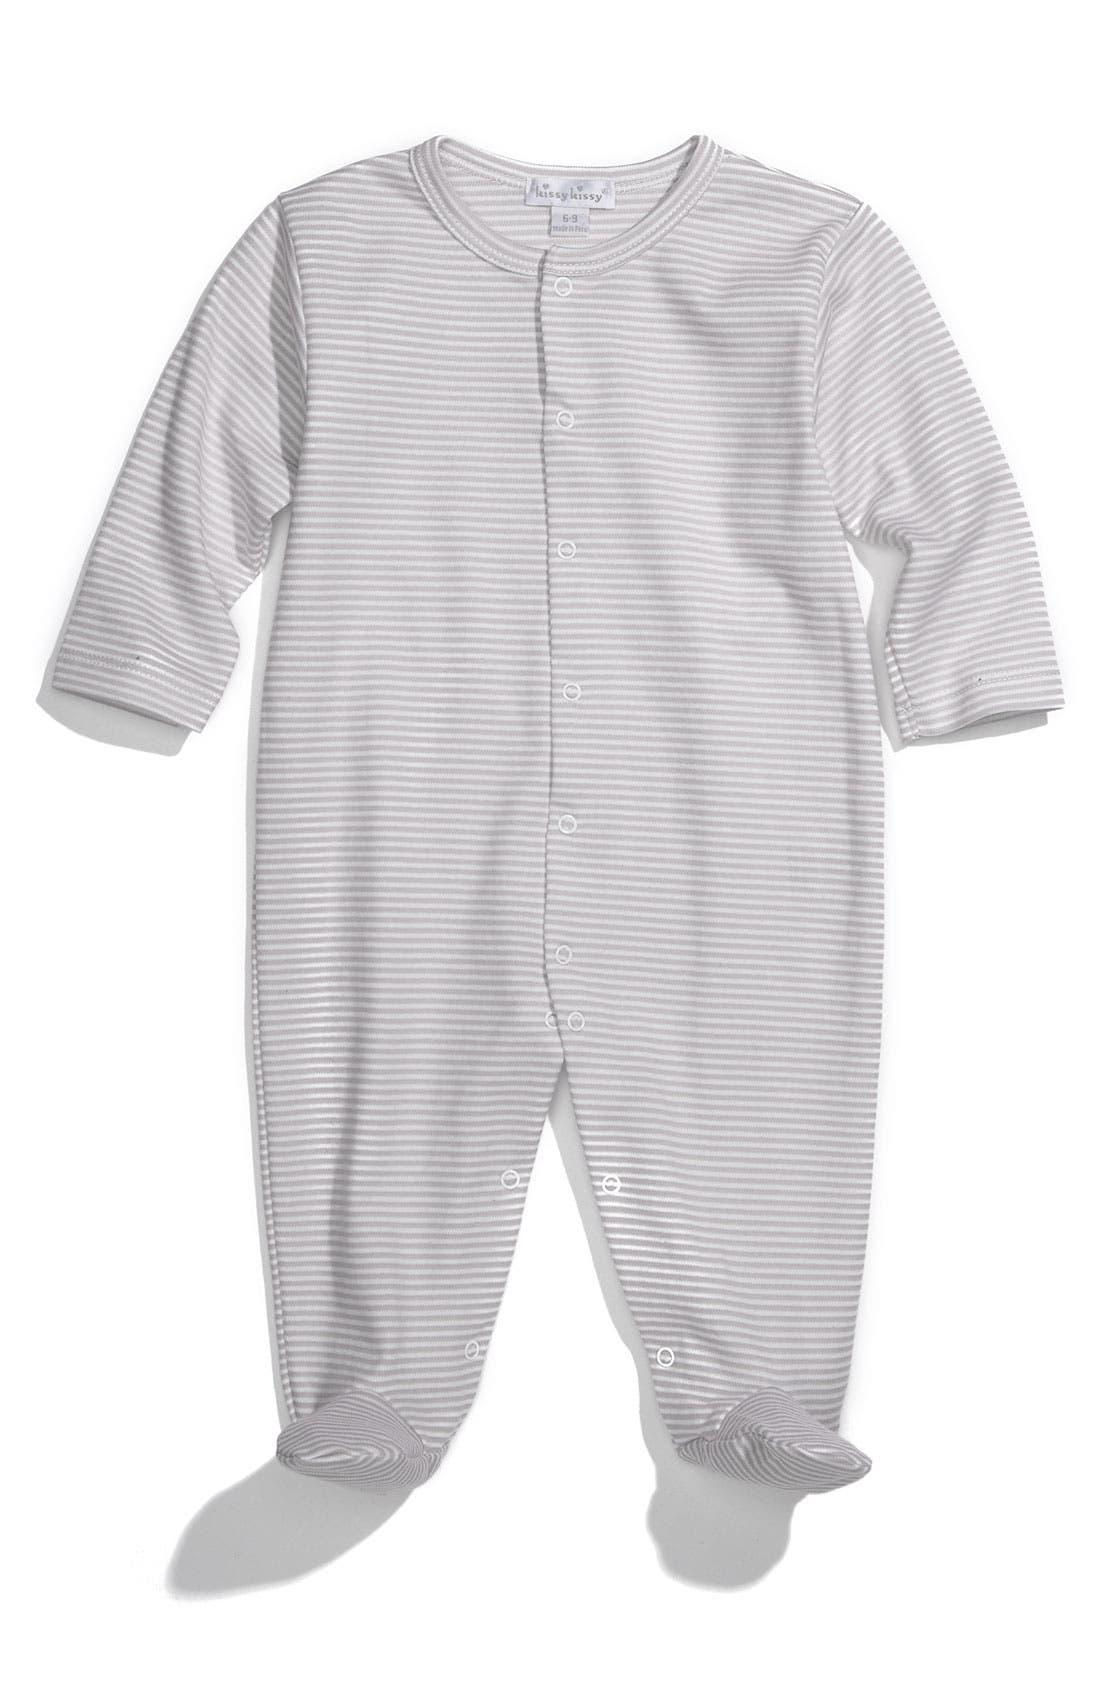 Alternate Image 1 Selected - Kissy Kissy Pima Cotton Footie (Infant)